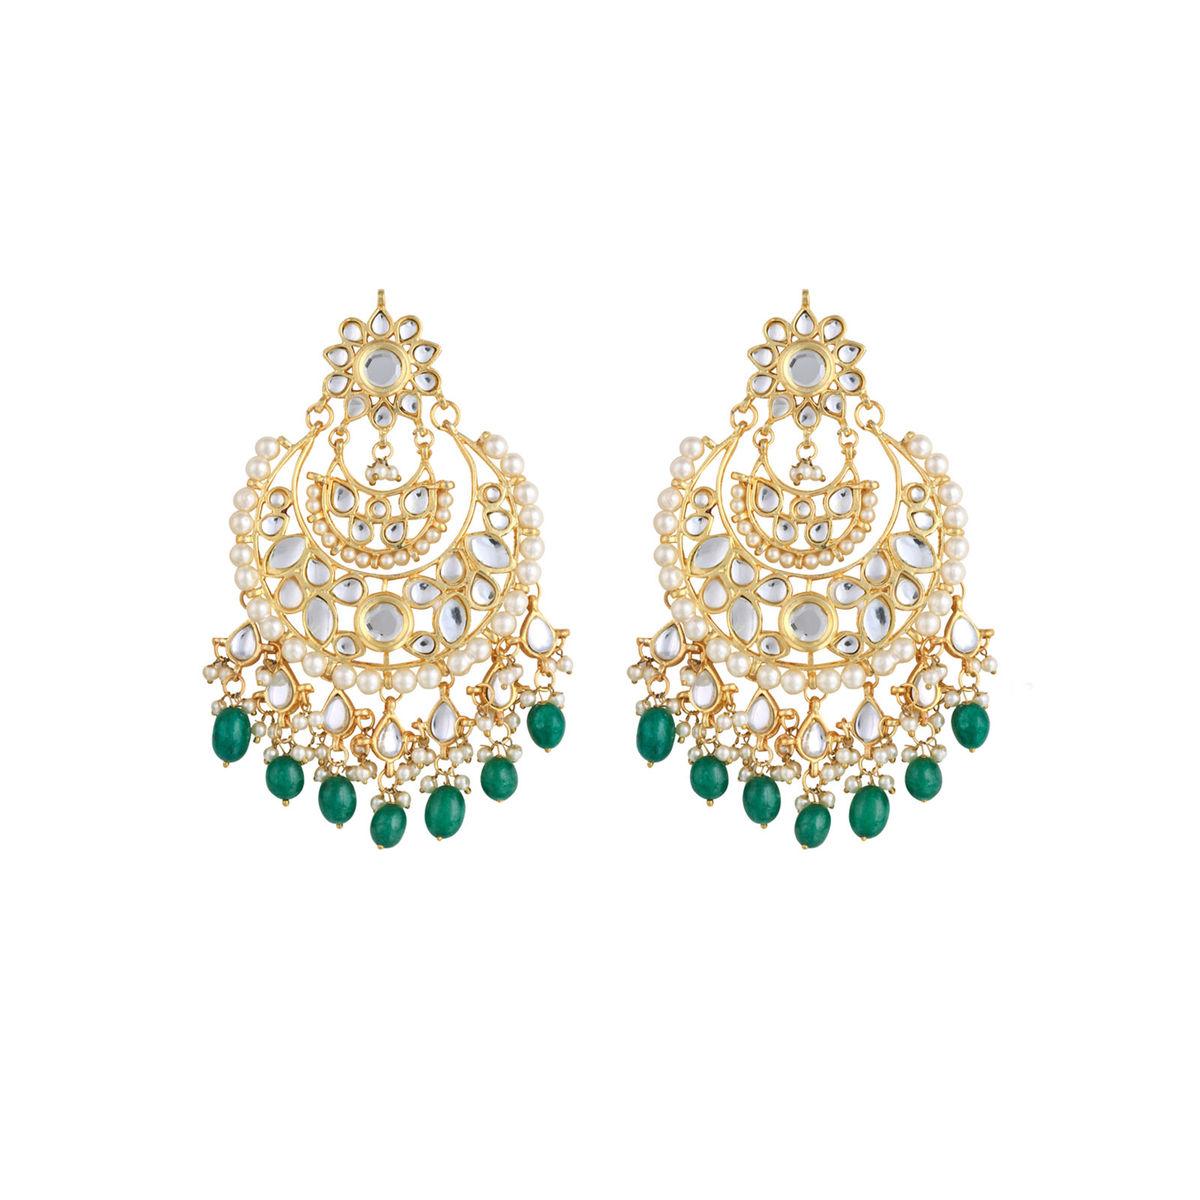 Kundan Emerald Chandbali earrings